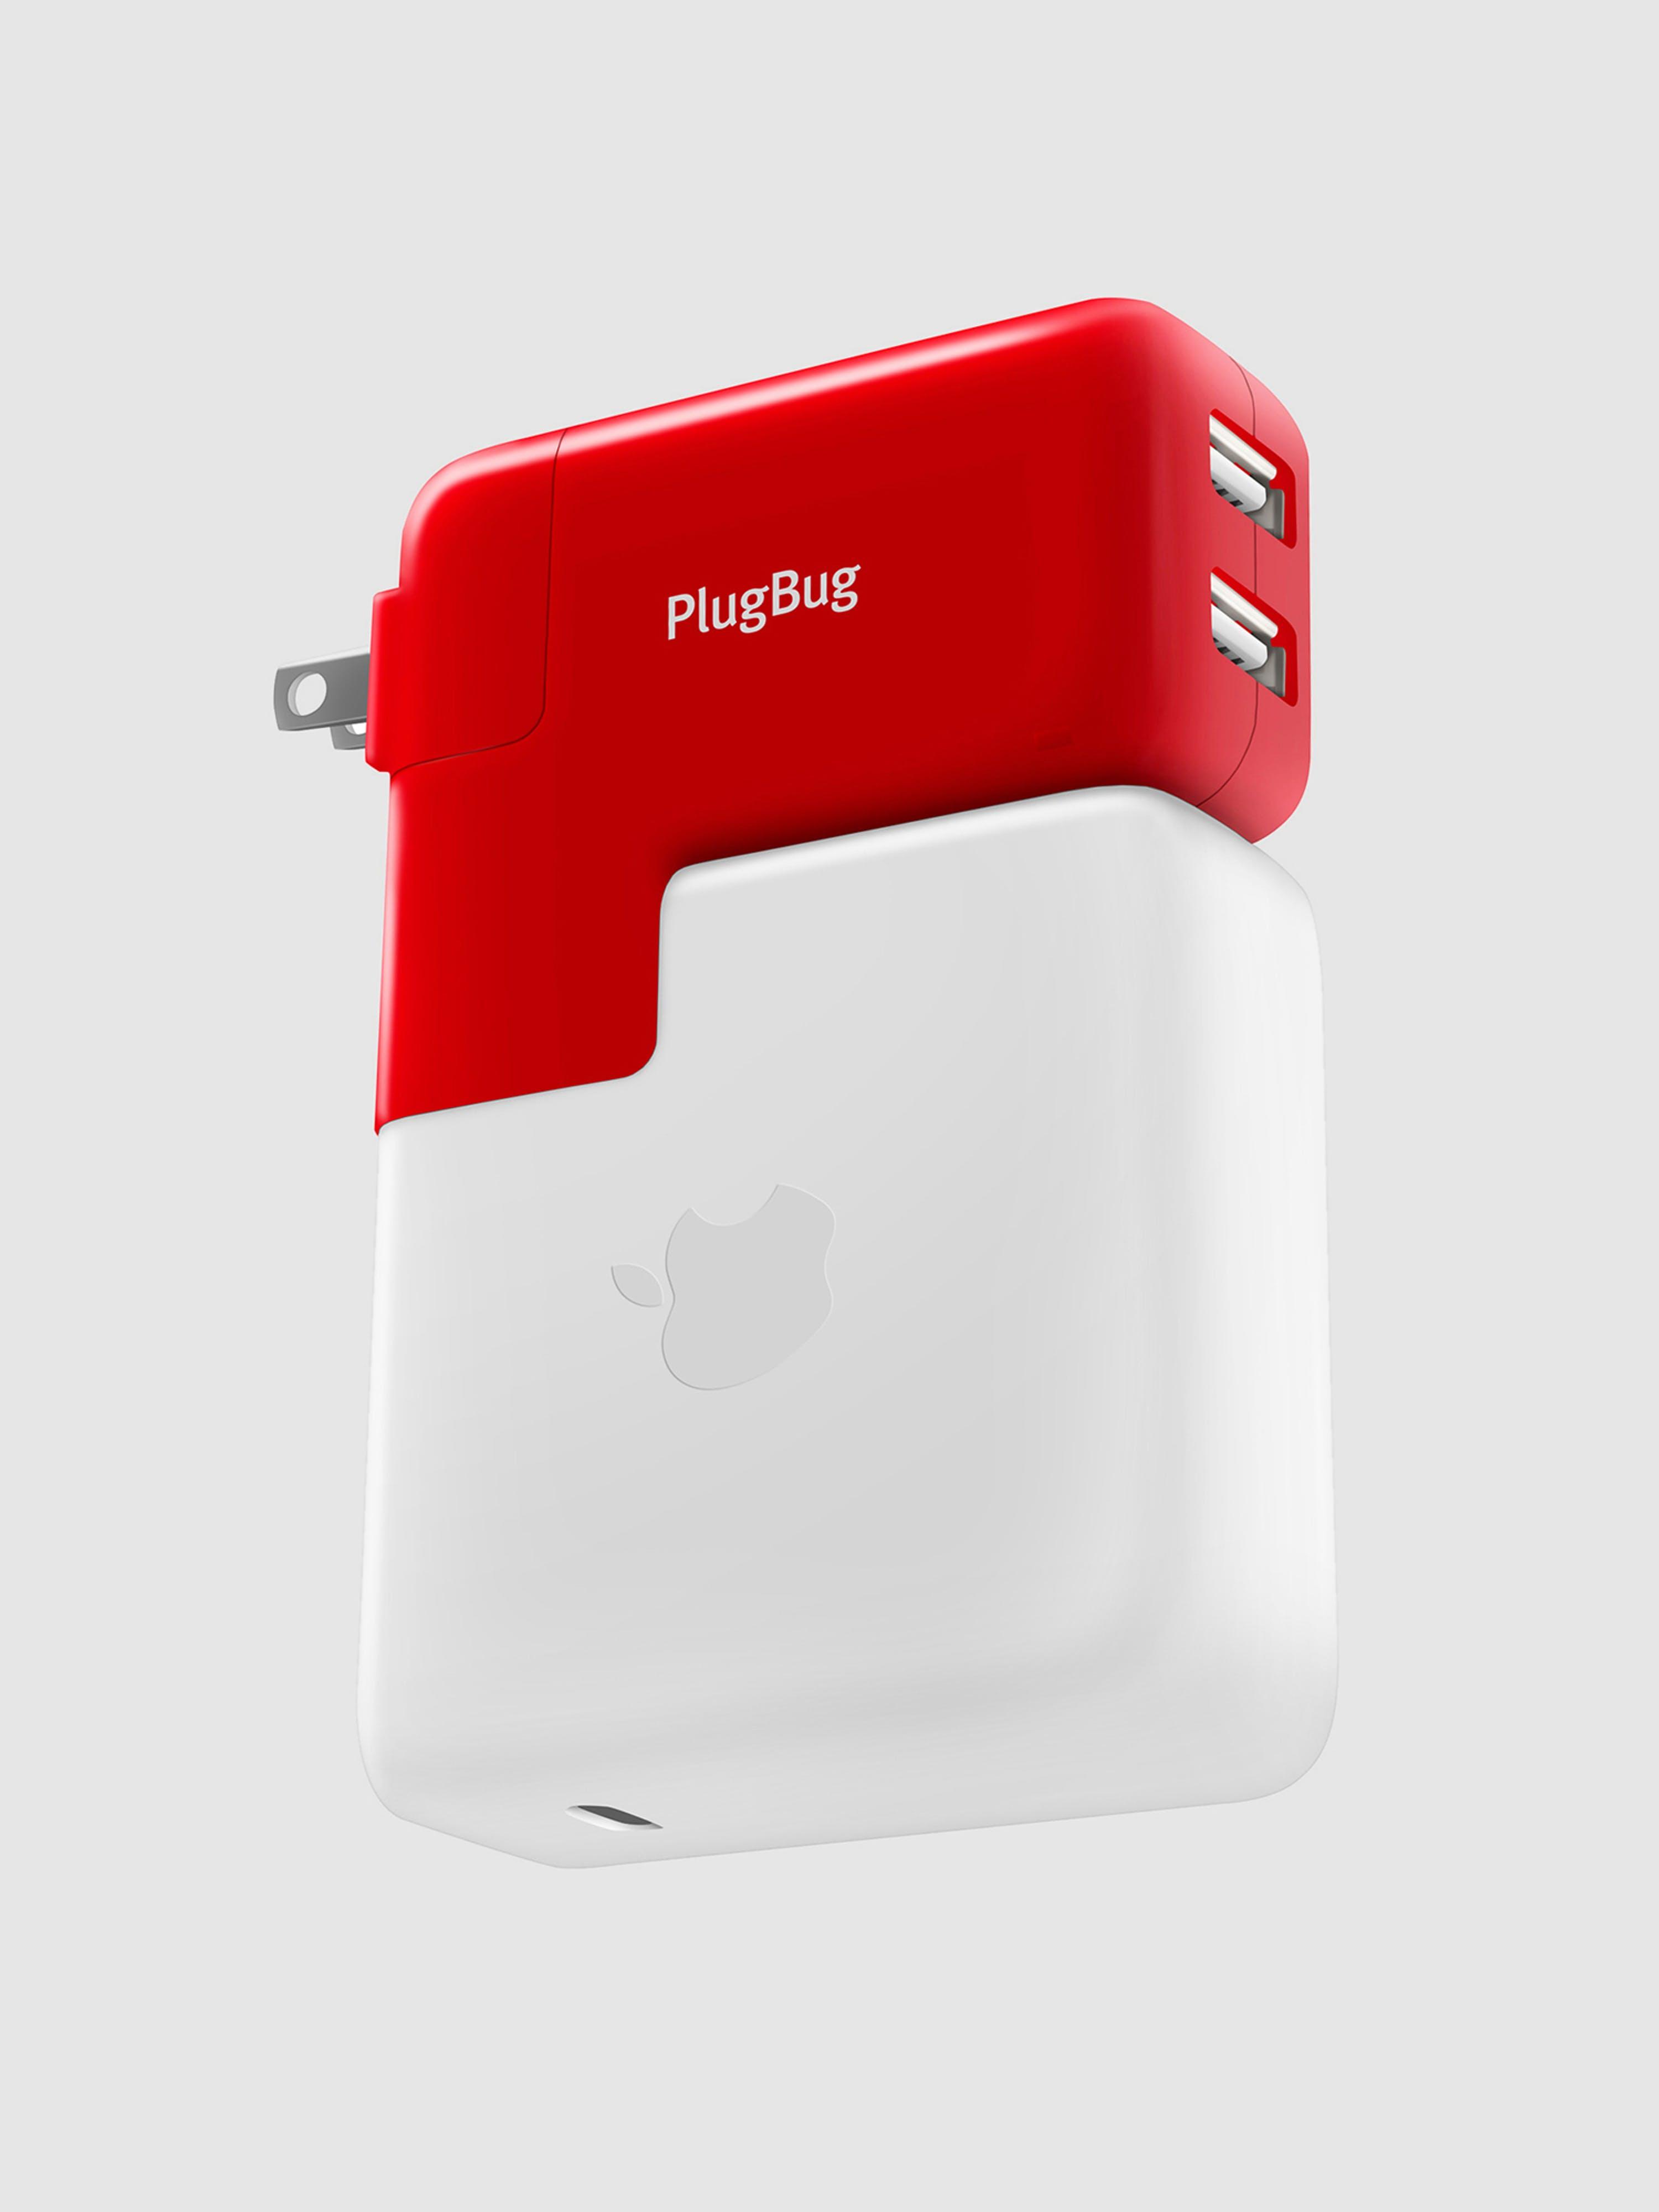 Twelve South - Verified Partner Plugbug Duo  - Red